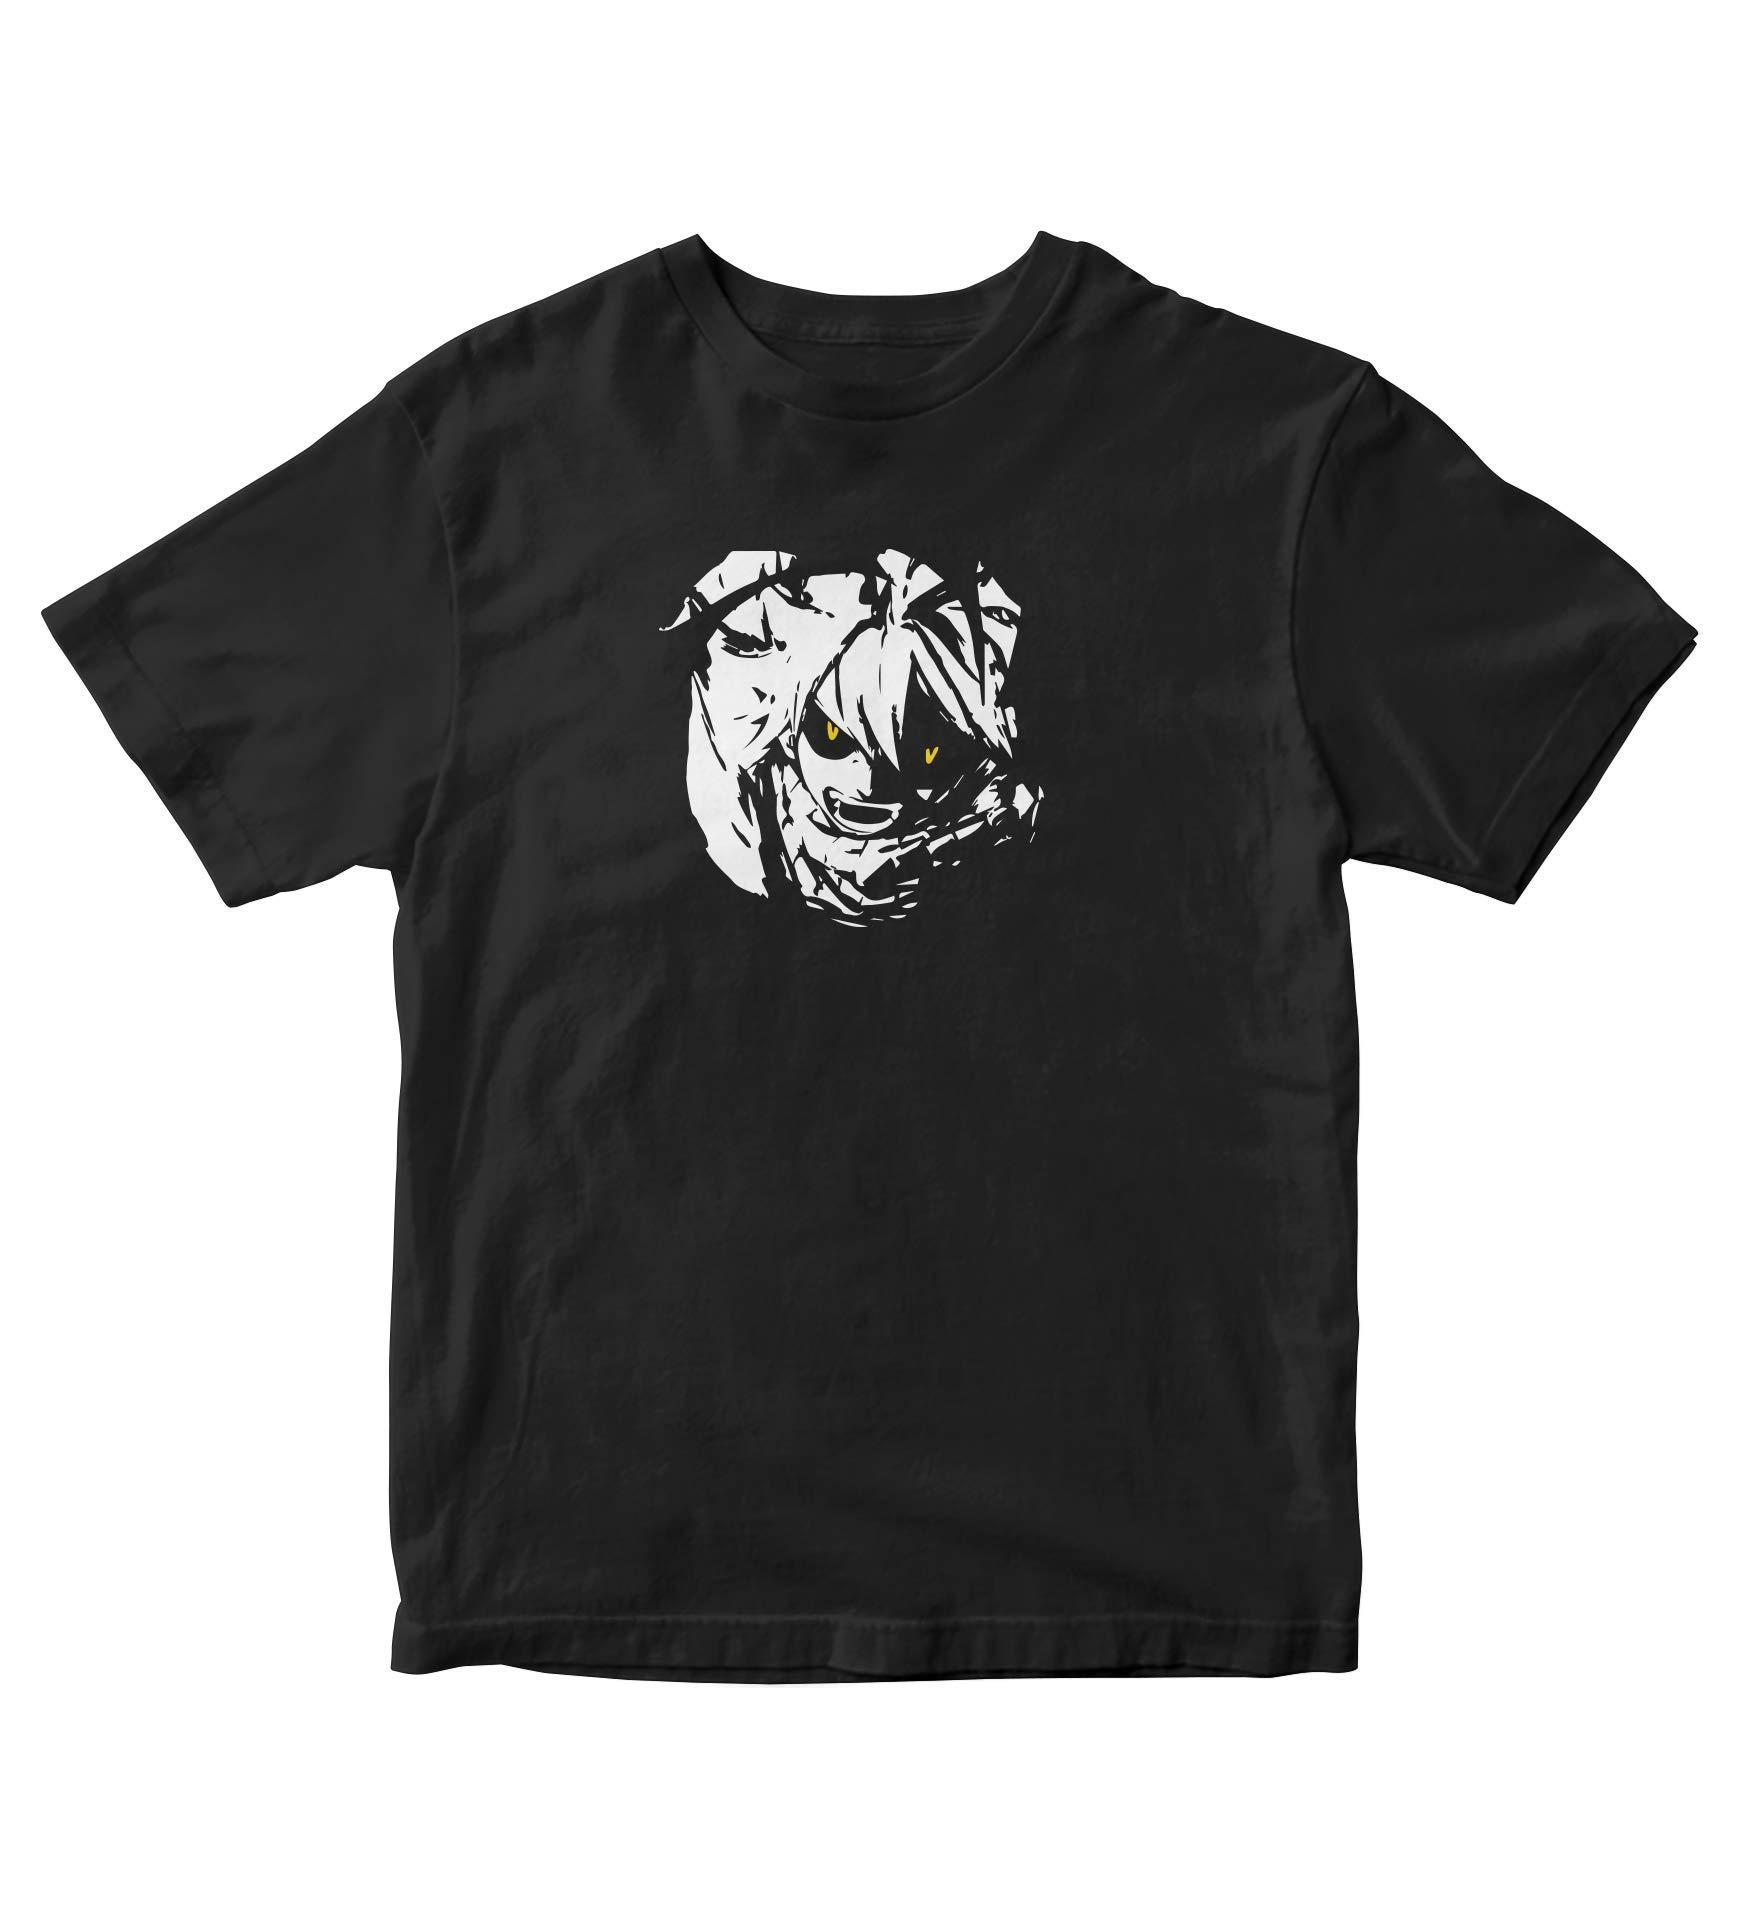 Fairy Tail Shirt The Great Demon Natsu Dragneel Anime Manga Man S Black A806